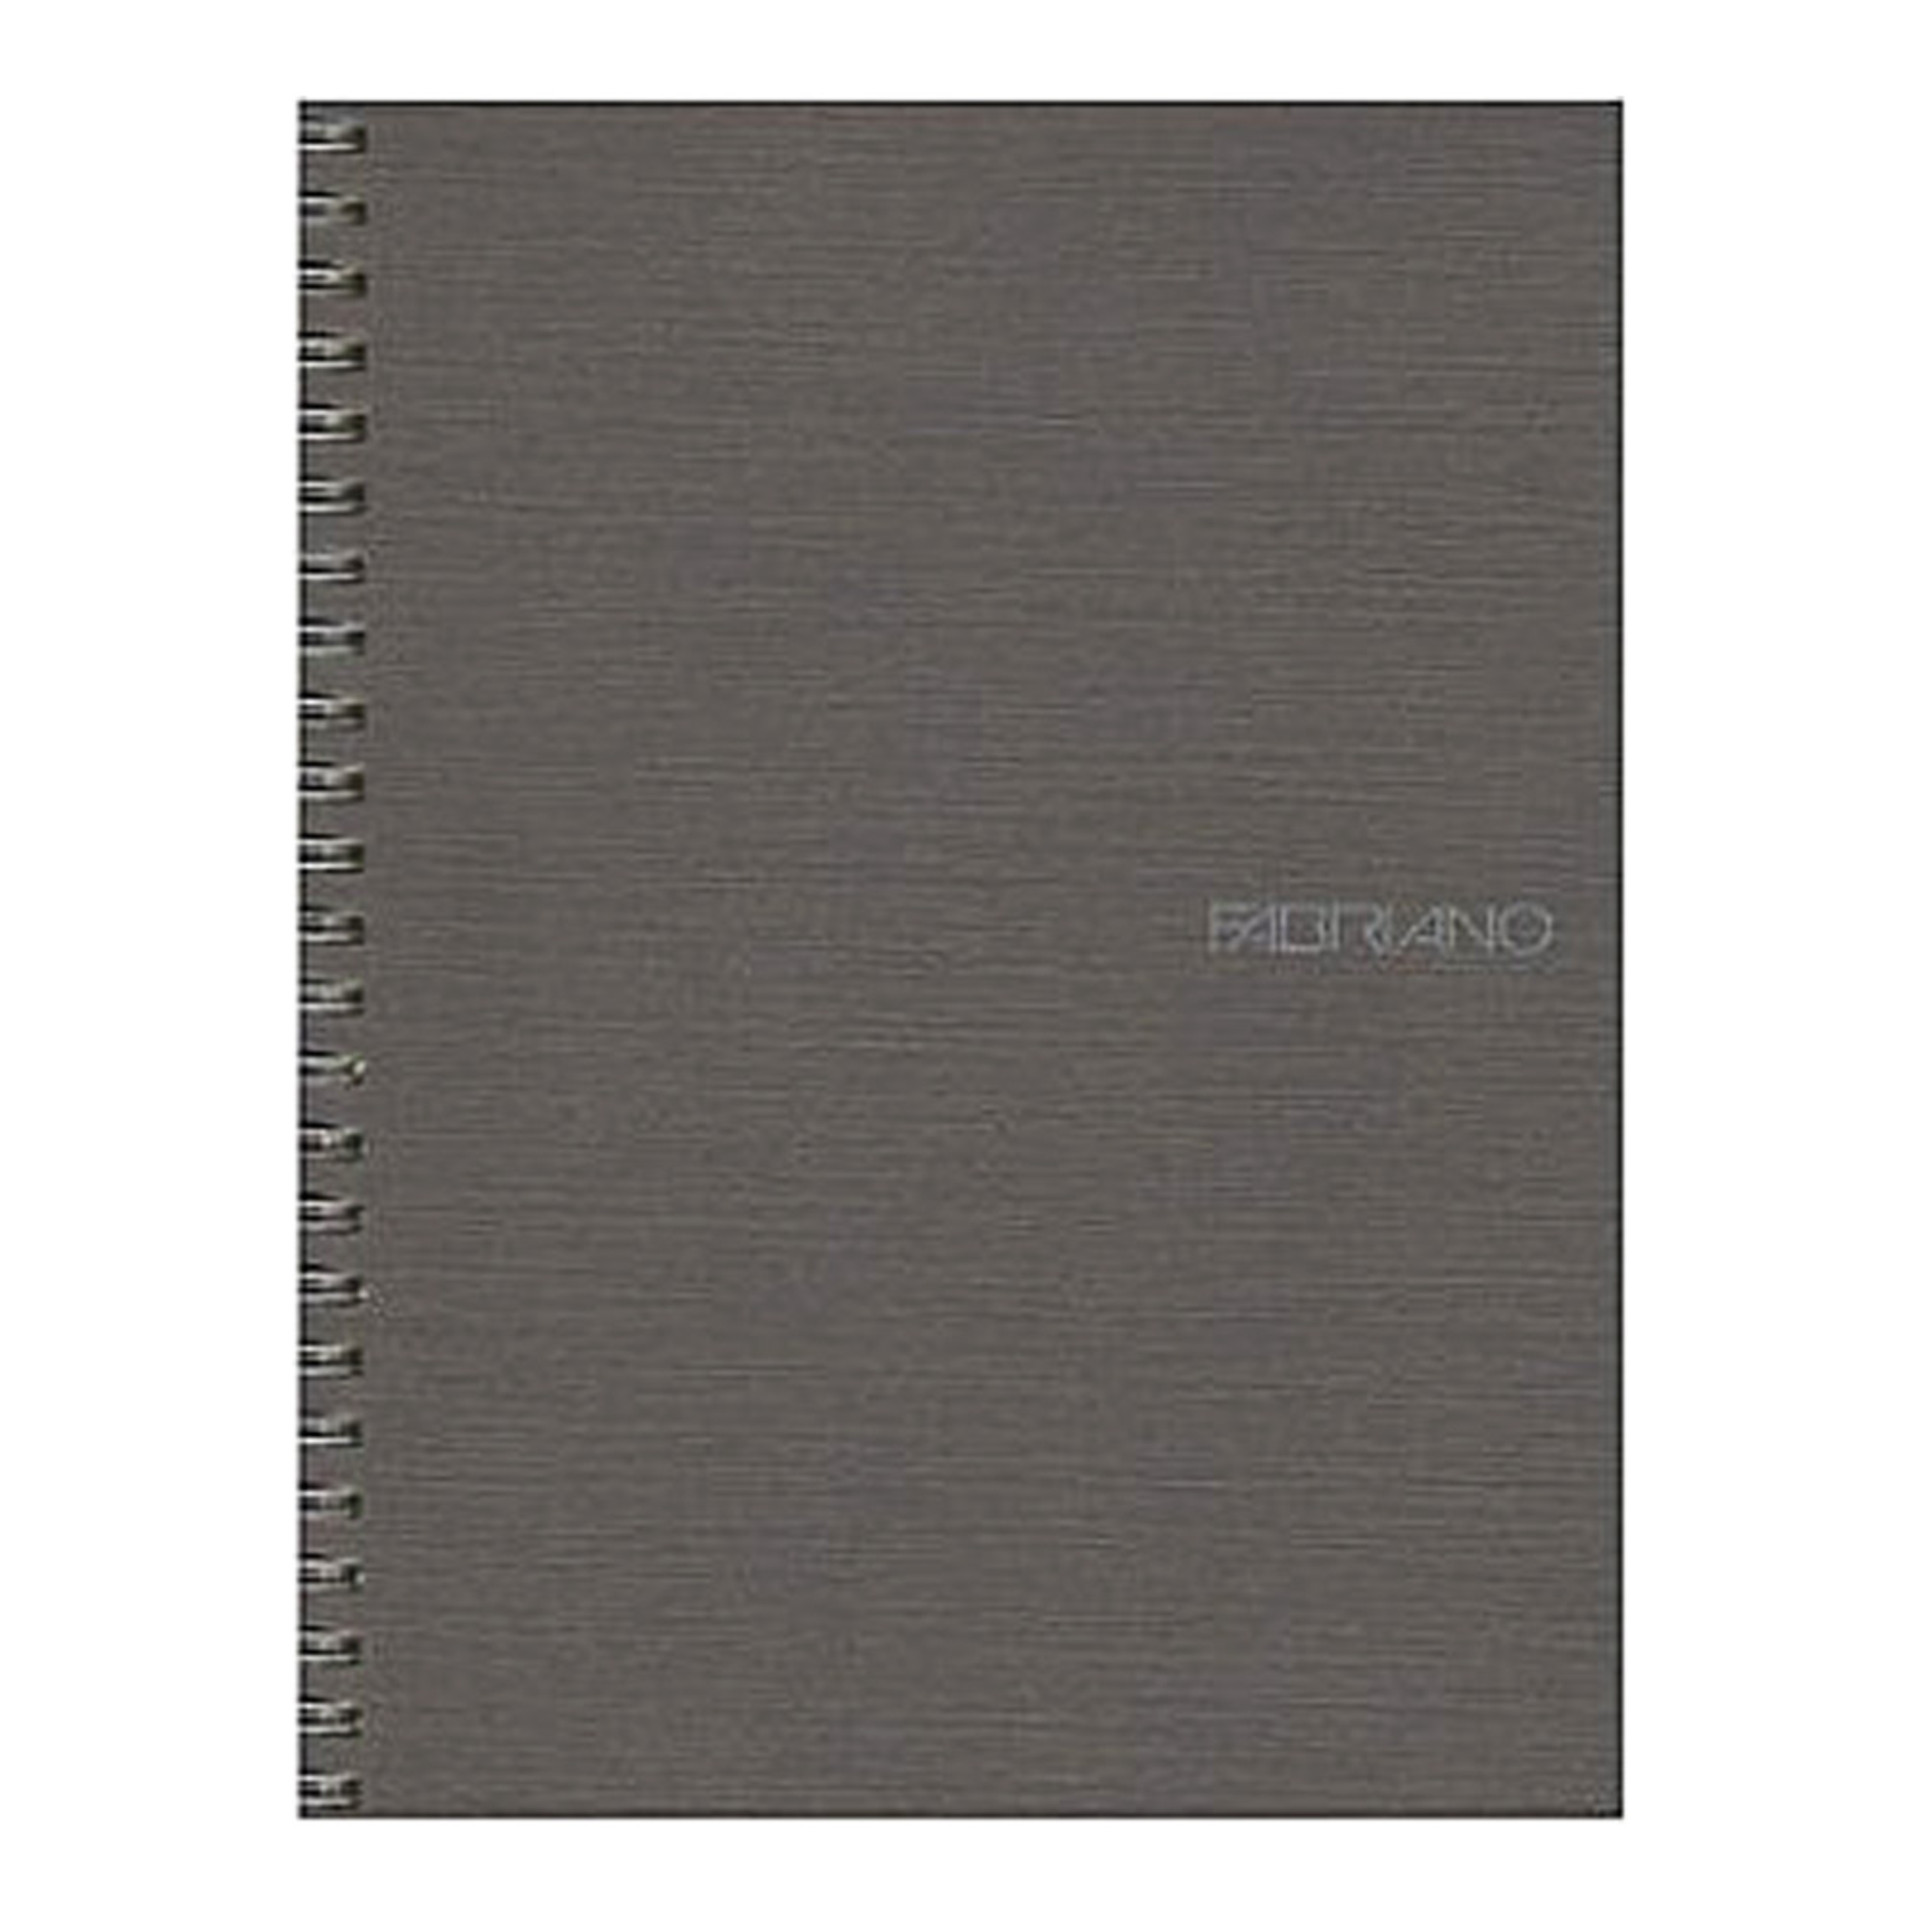 "Fabriano EcoQua Wire Bound Blank 6""x8"" Notebook Stone"